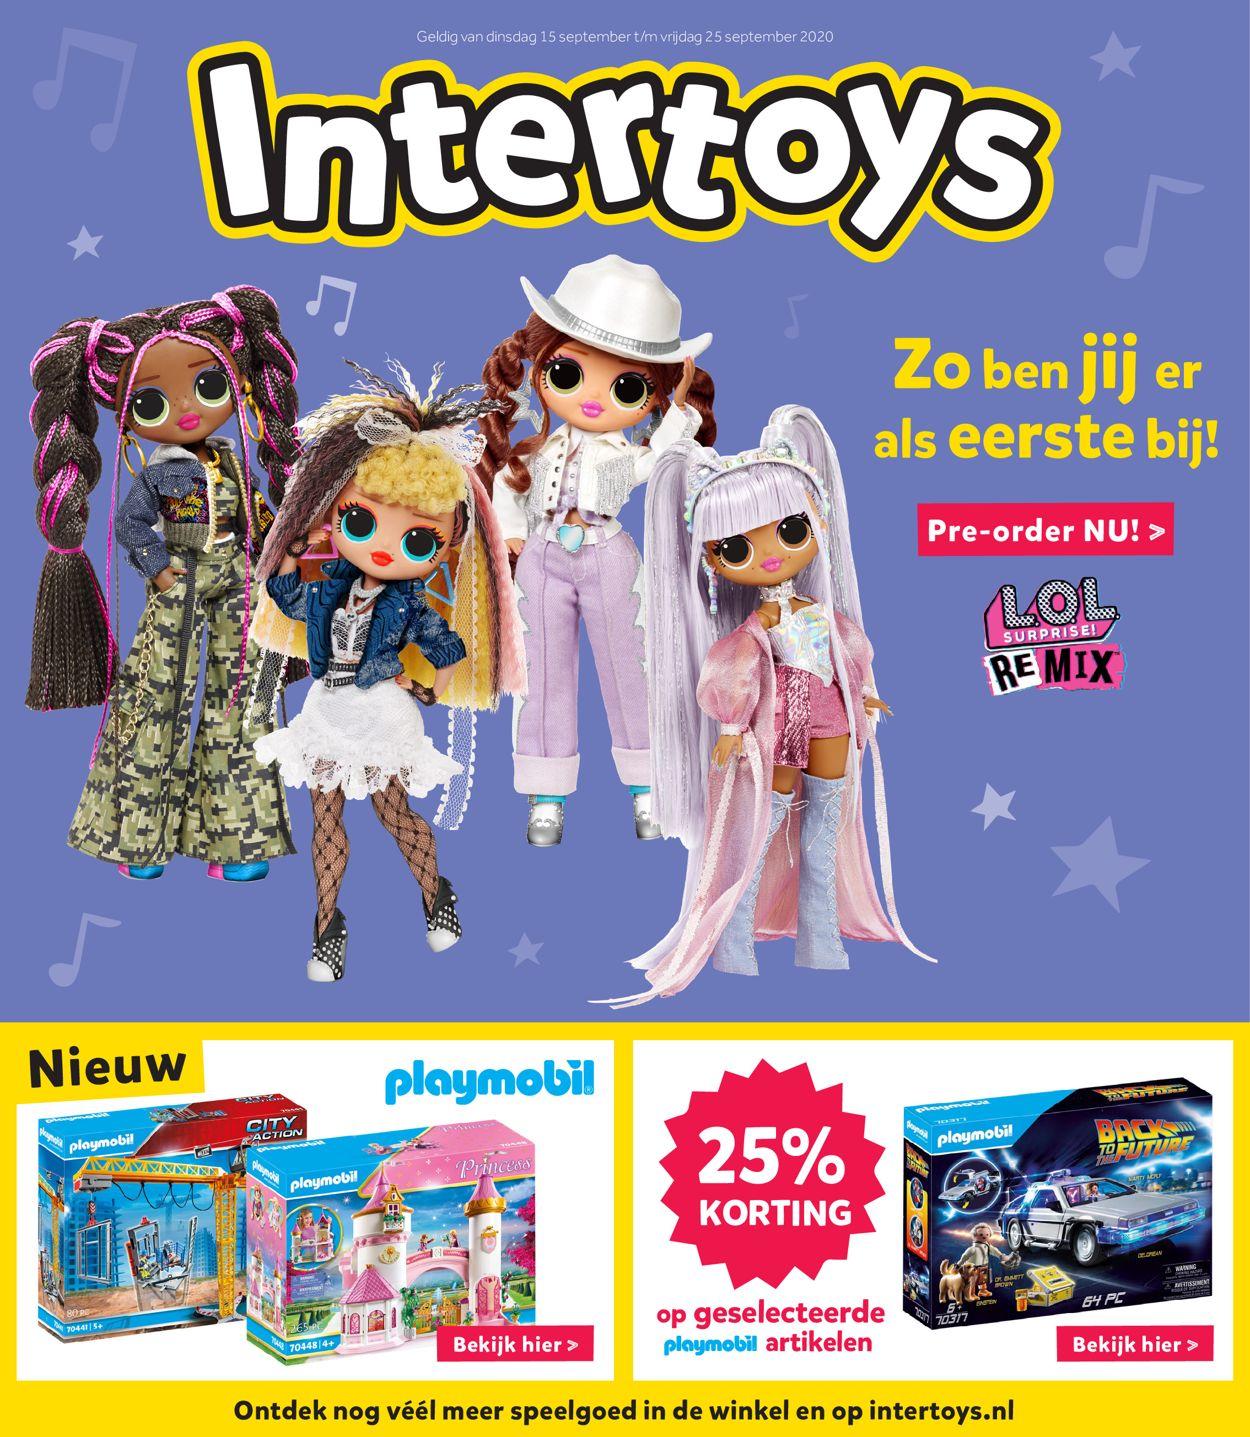 Catalogus van Intertoys van 15.09.2020